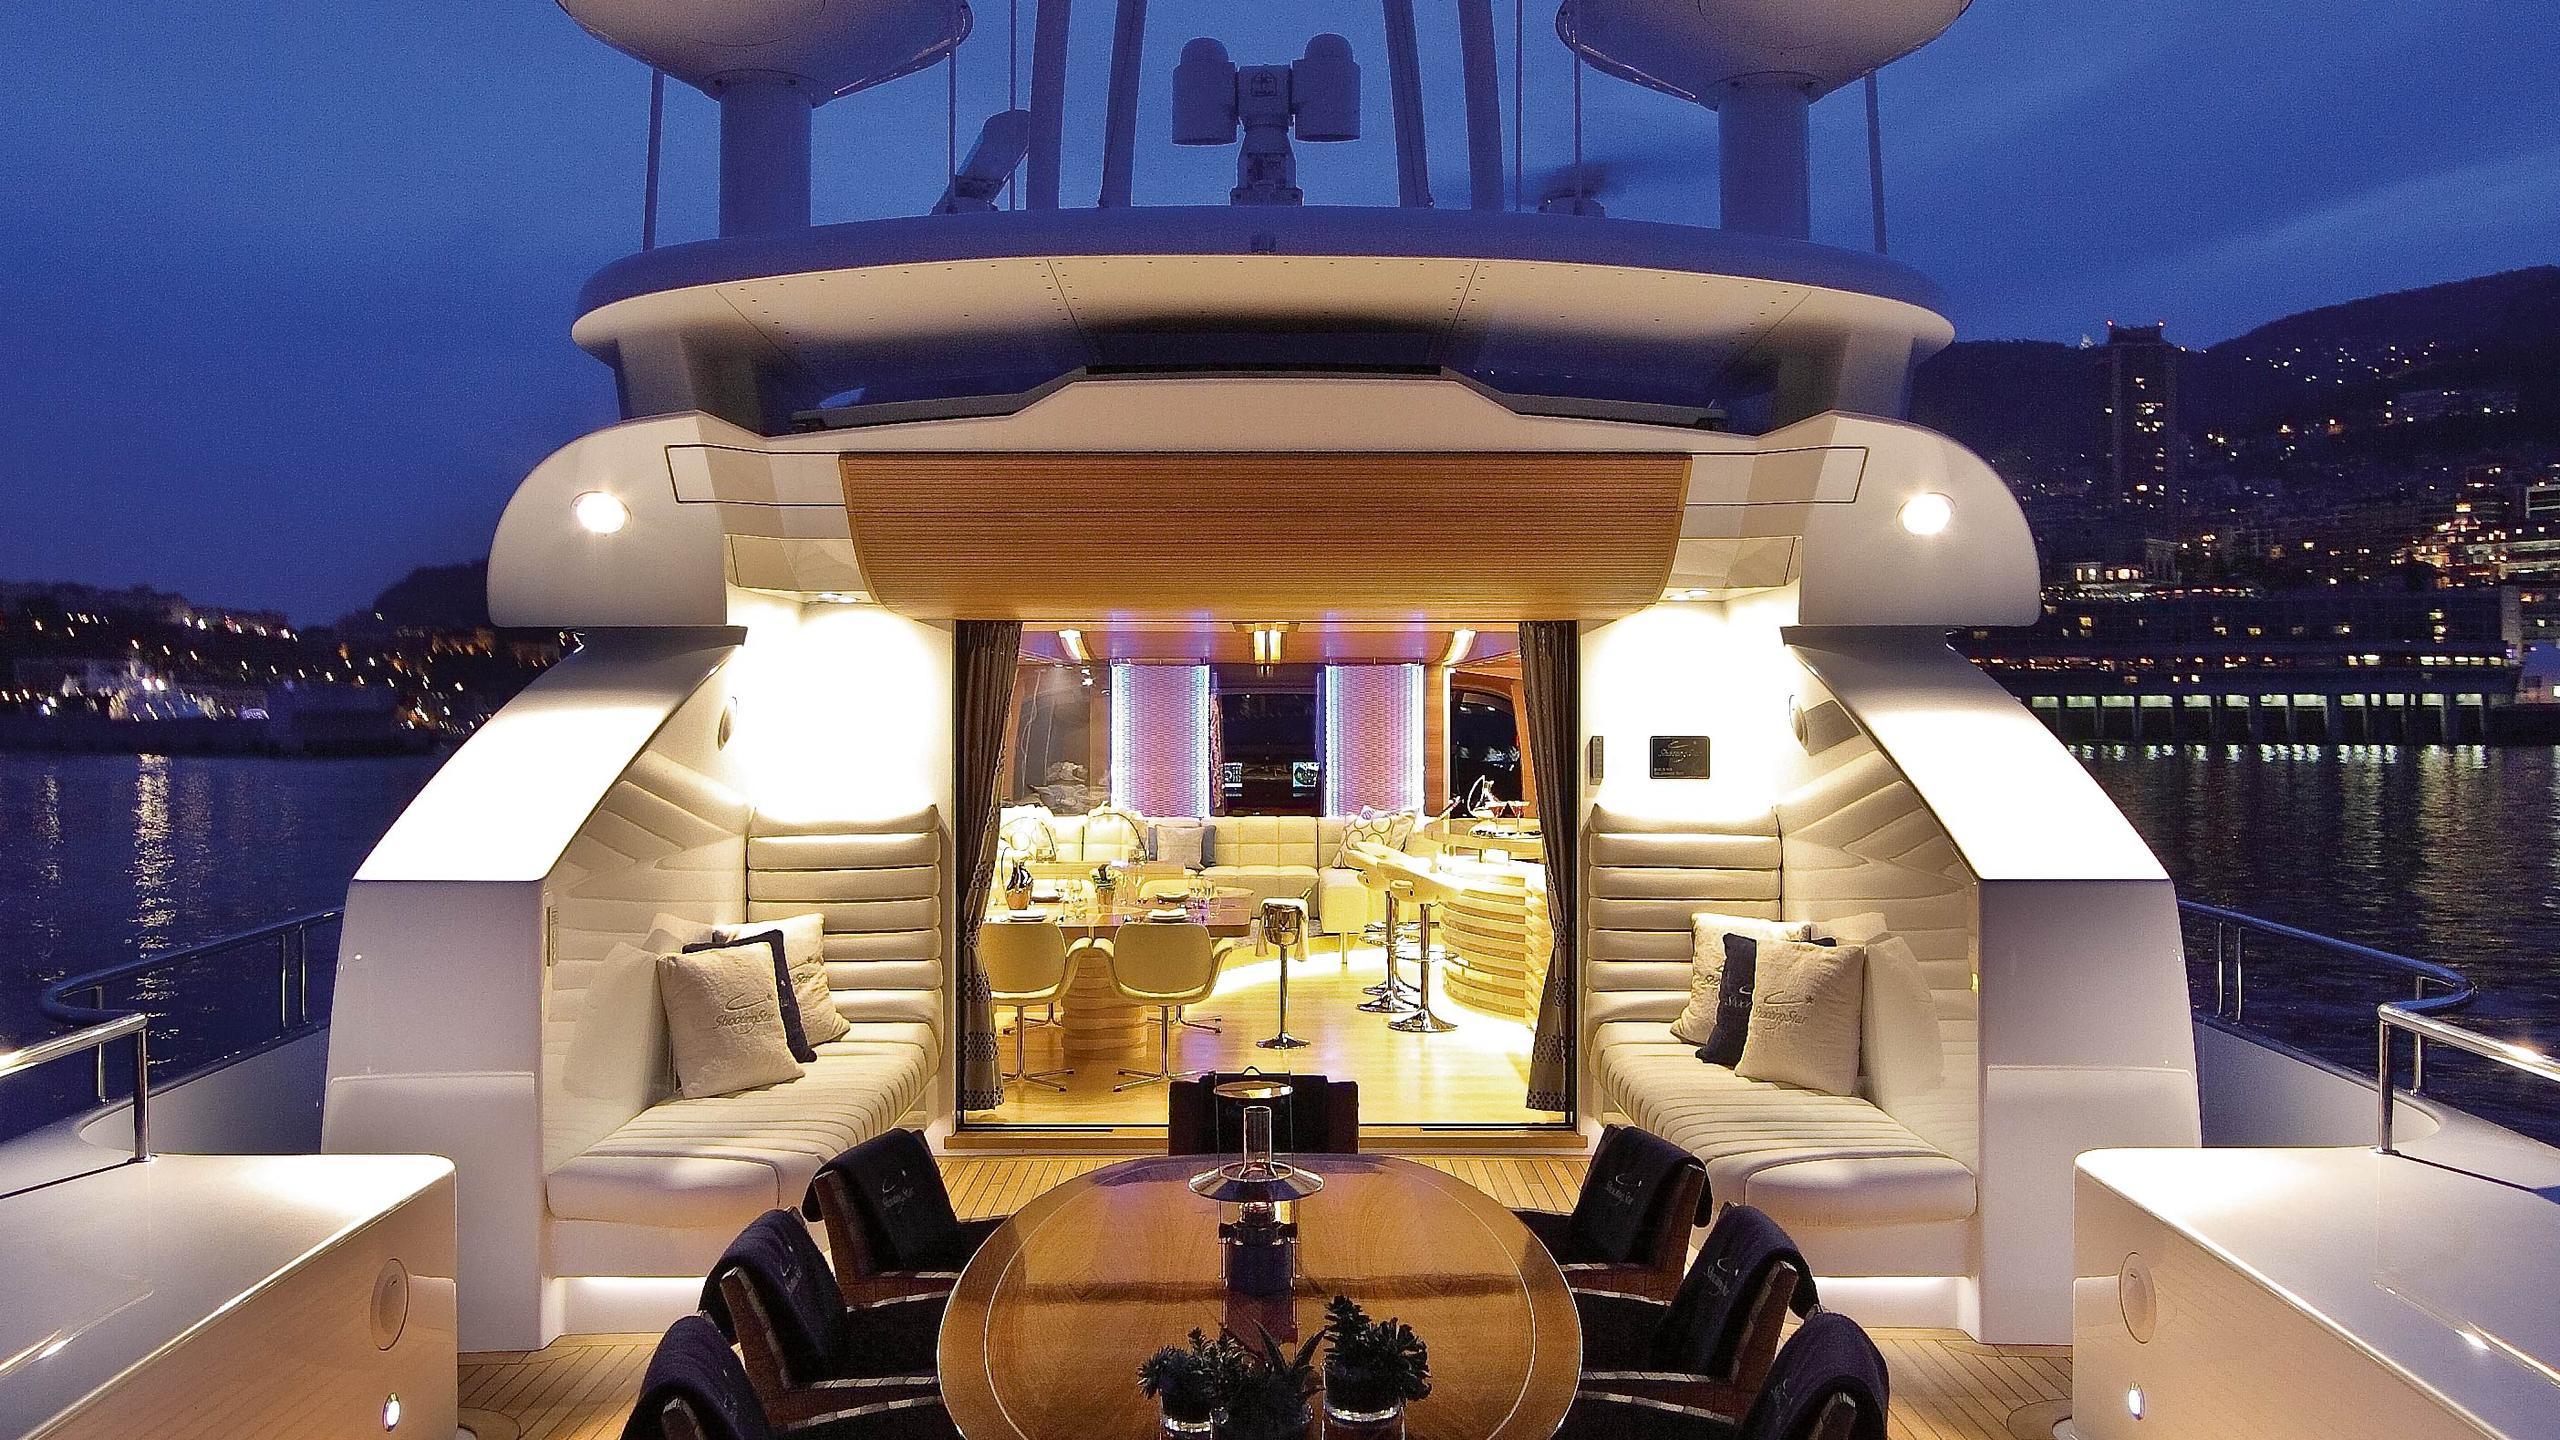 butterfly-motor-yacht-danish-2011-38m-deck-by-night